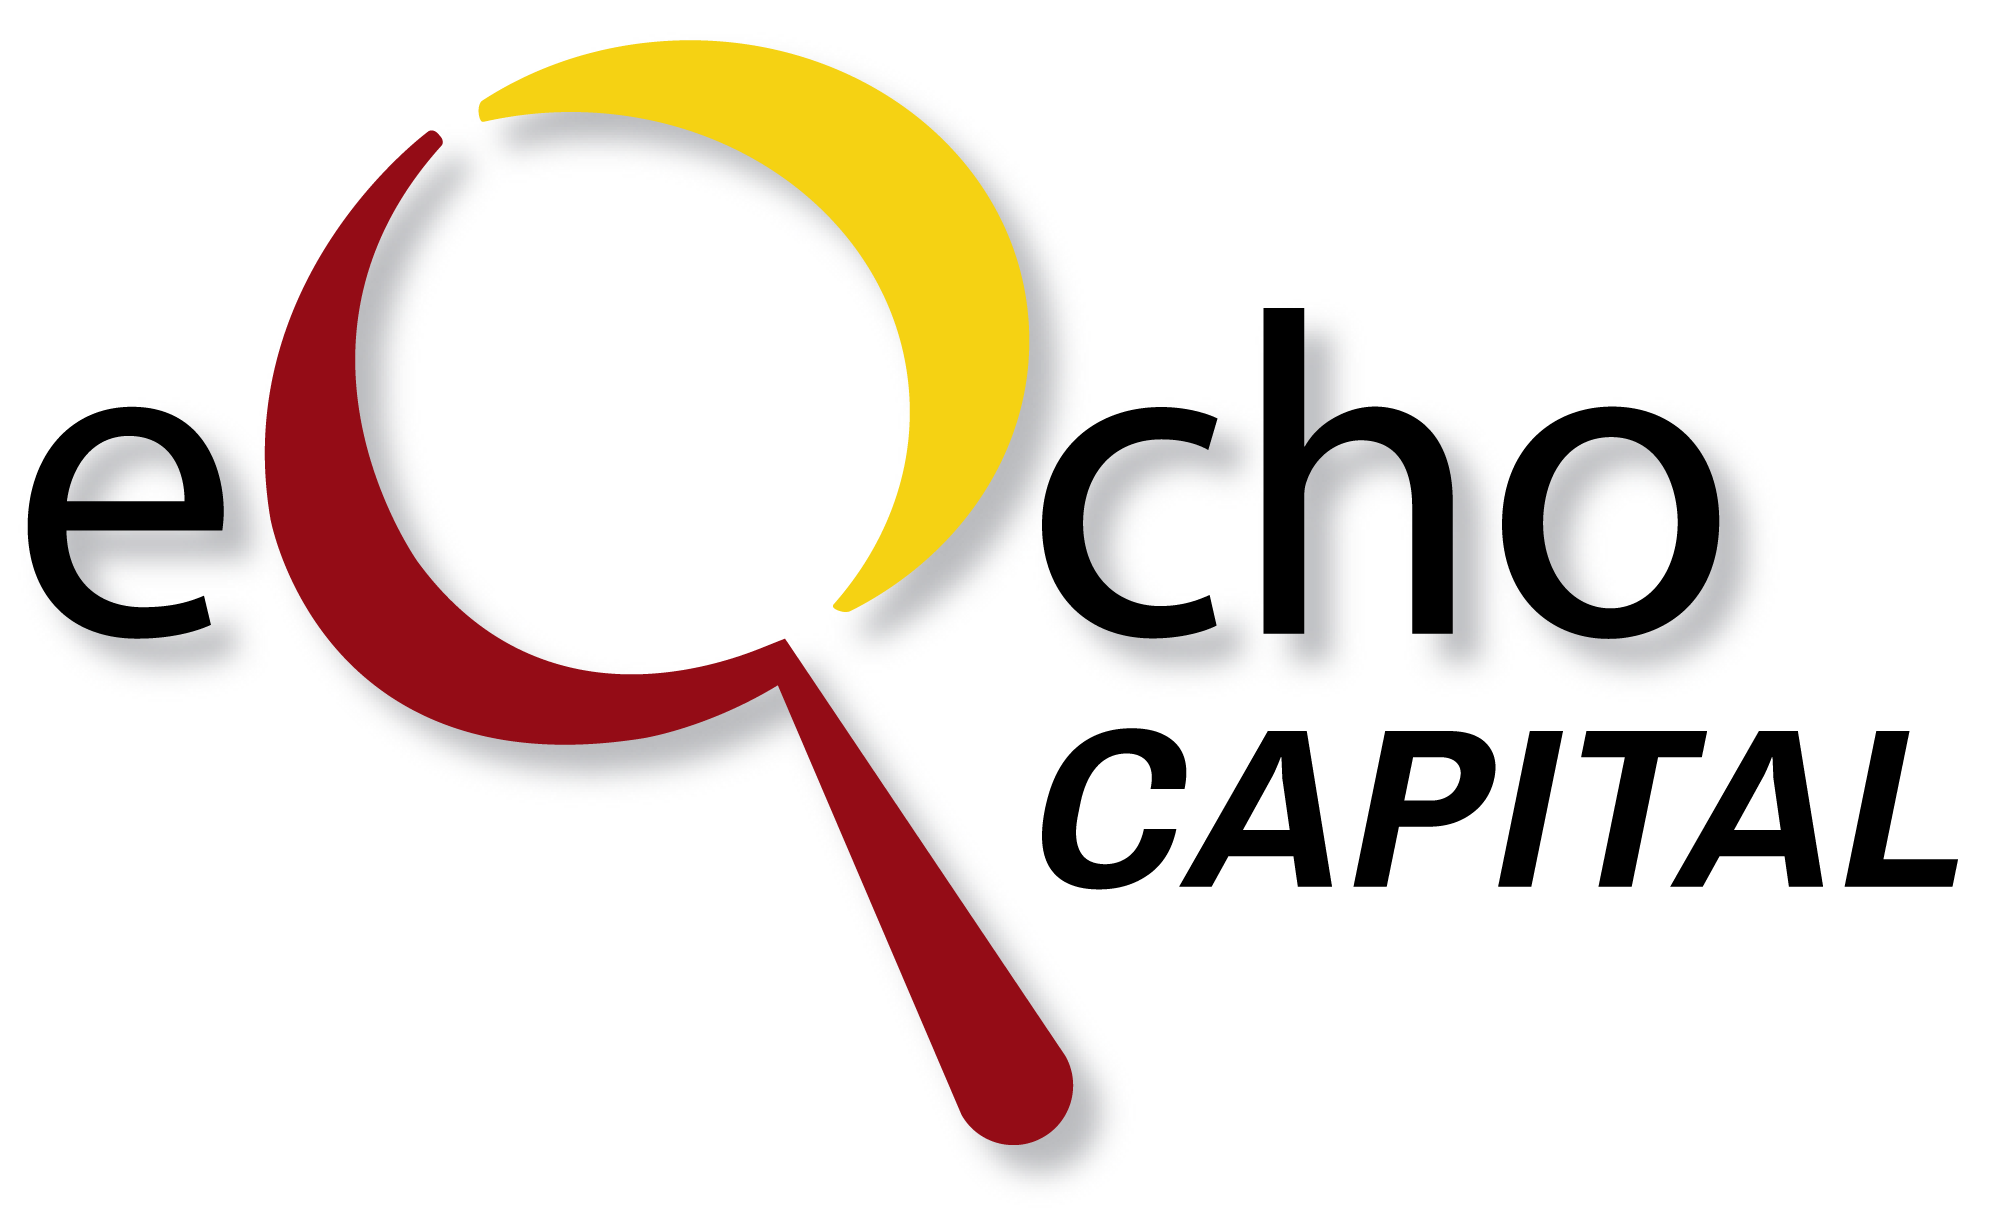 eqcho capital logo